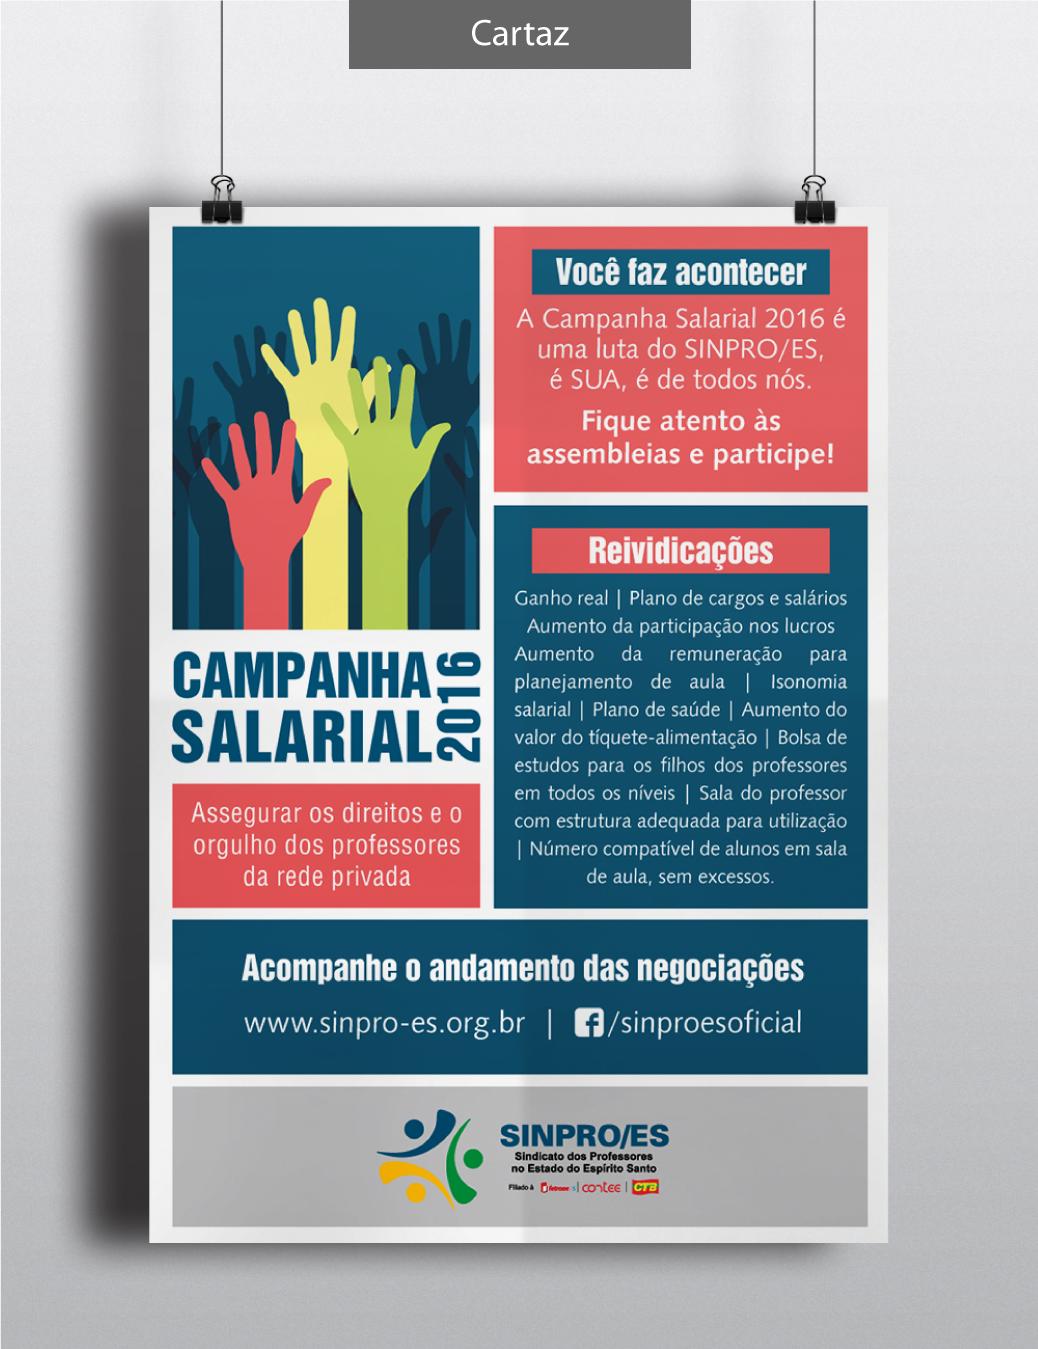 wce-site-novo-2016-portfolio-campanha-salarial-sinpro-img2